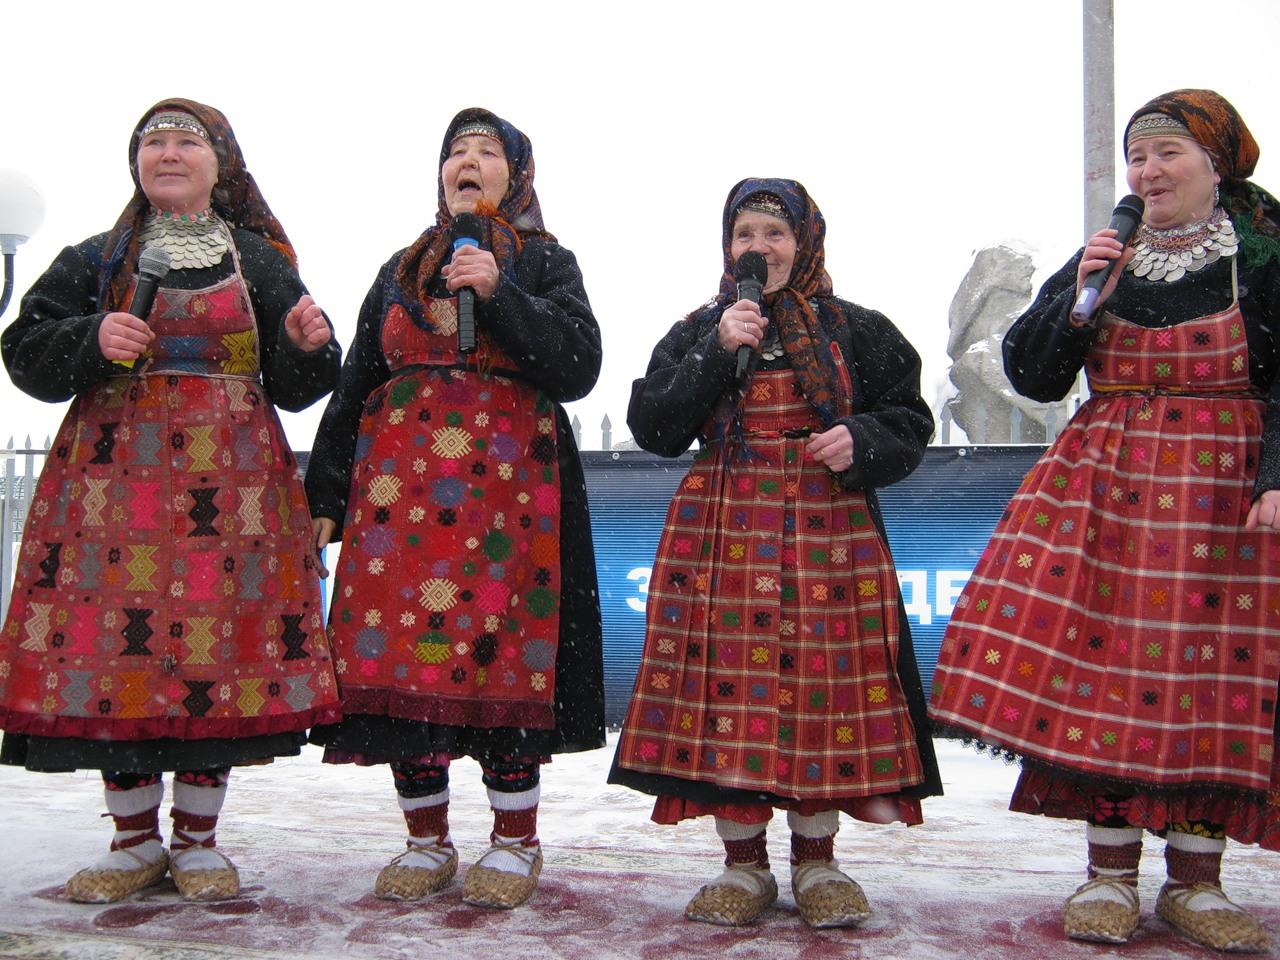 100 Images of Buranovskiye Babushki